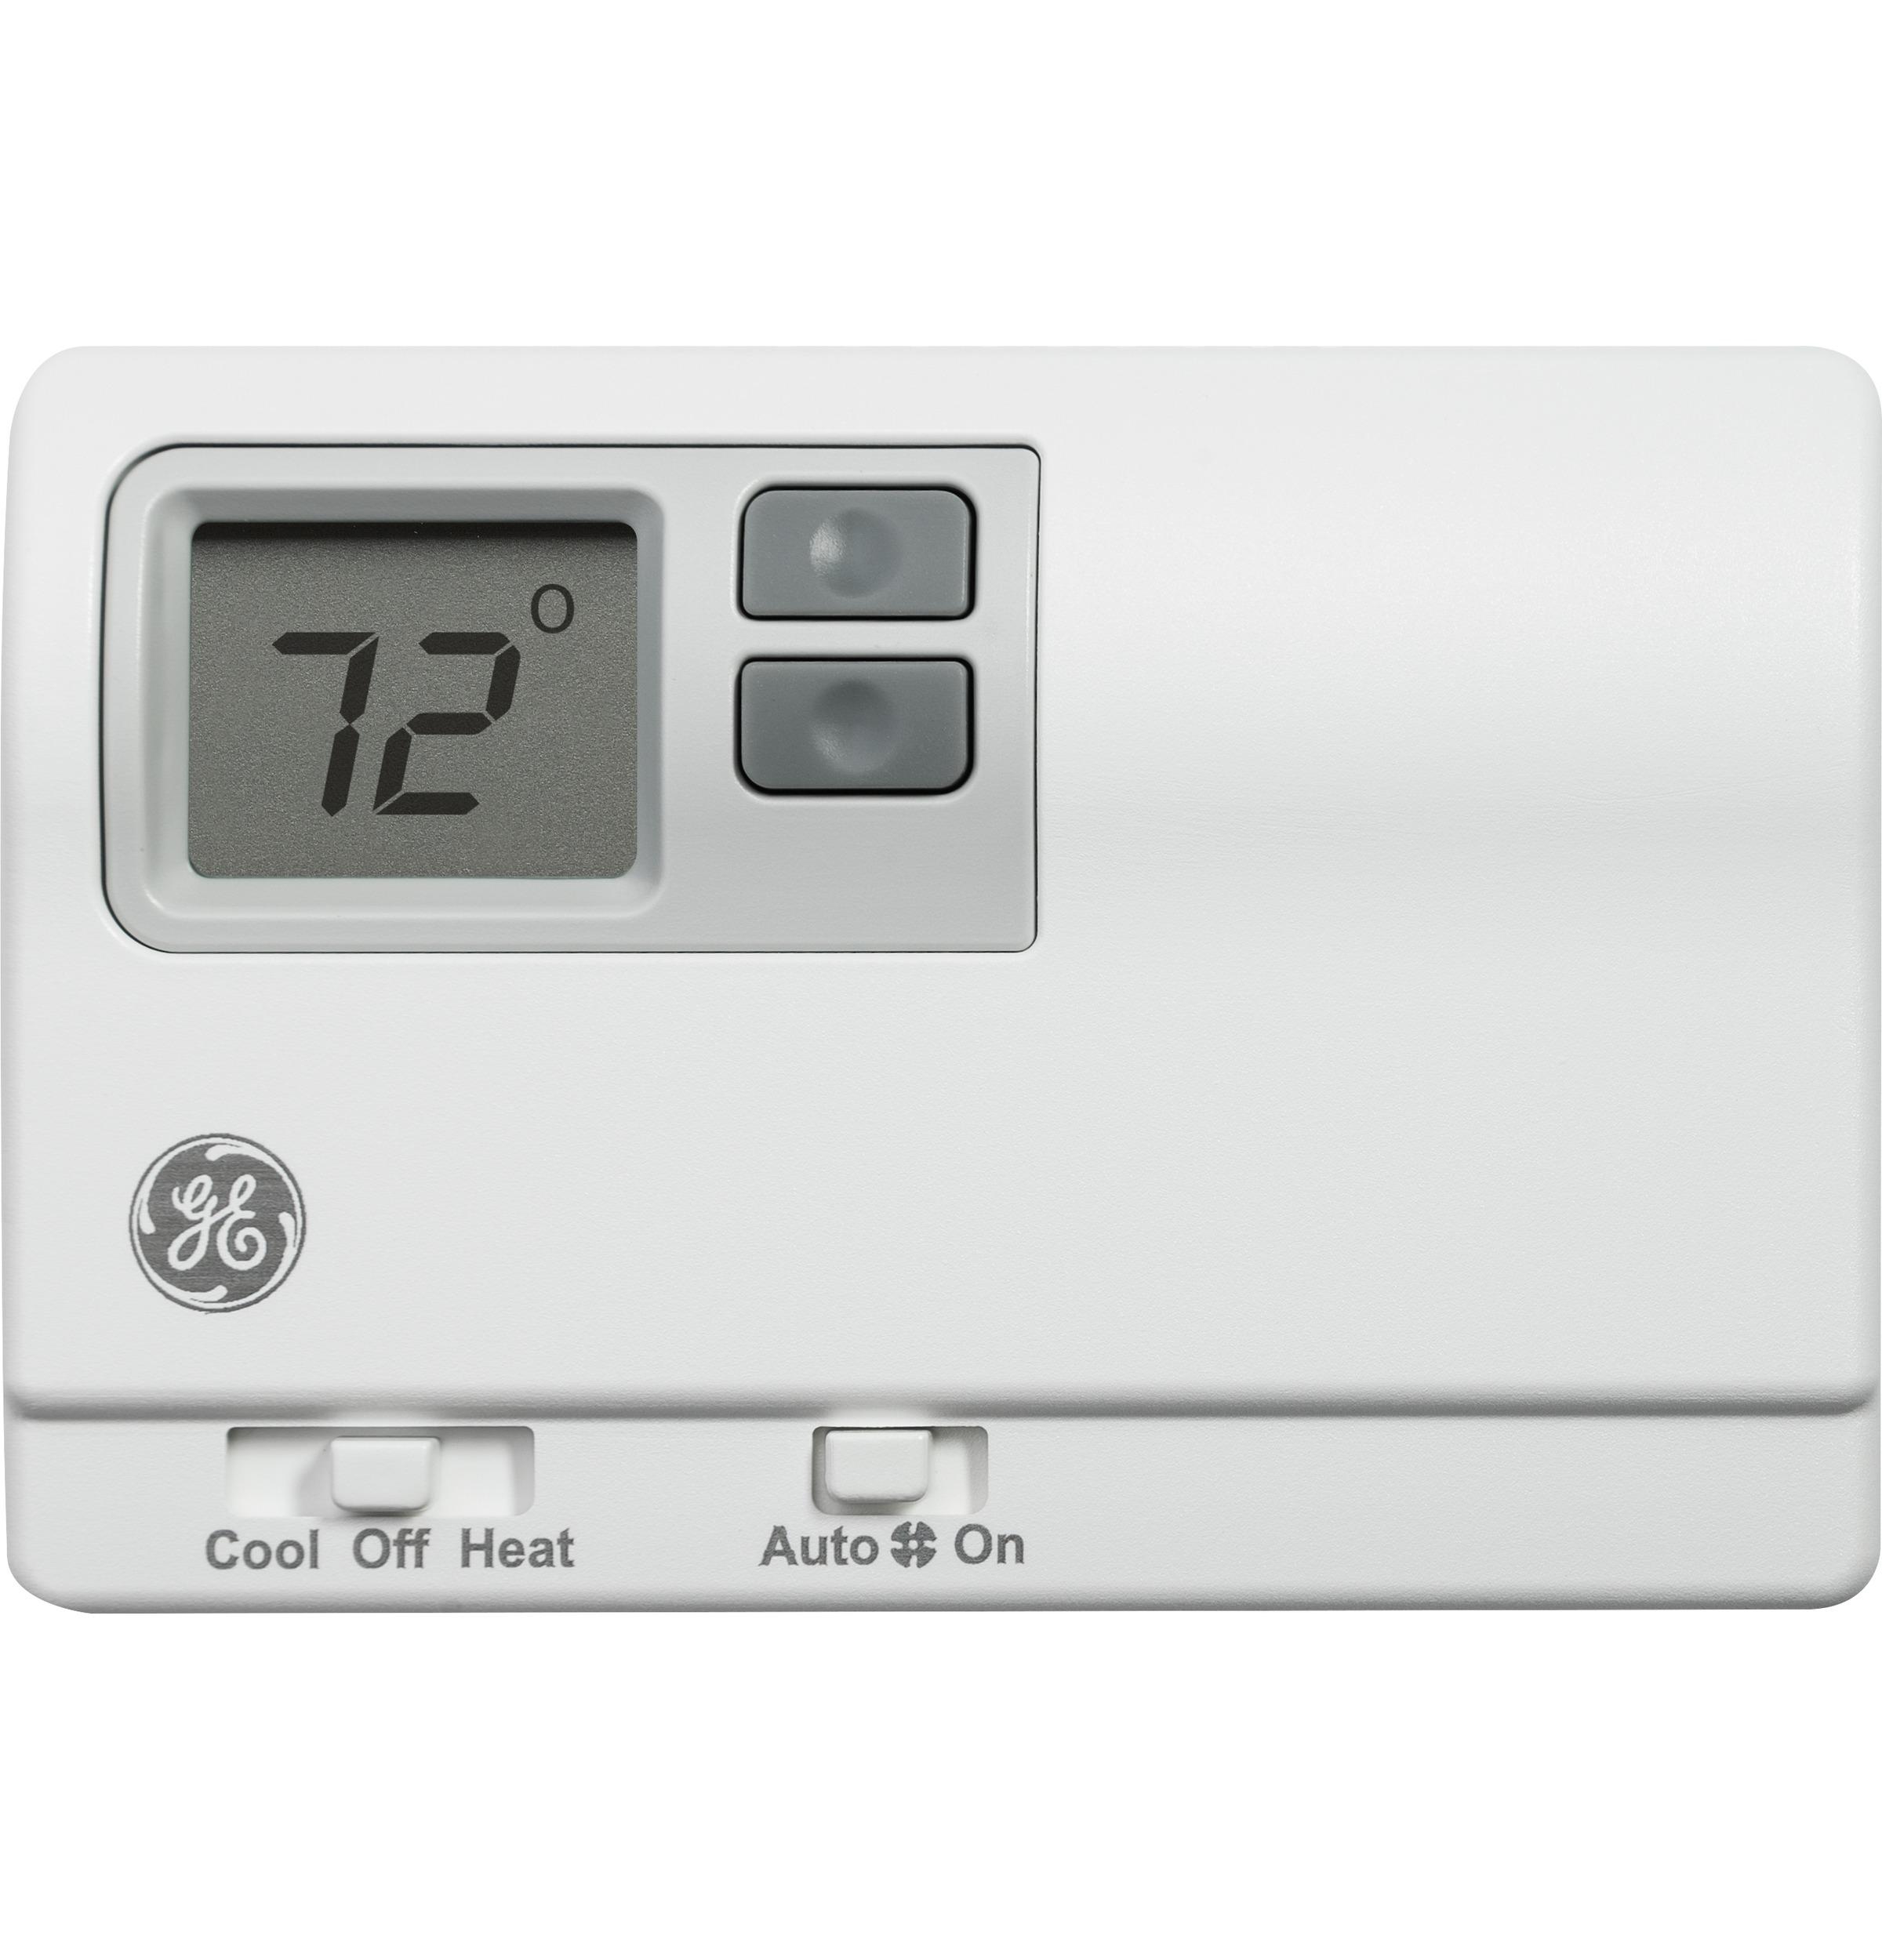 RAK148D2 Digital Thermostat for Heat Pump on